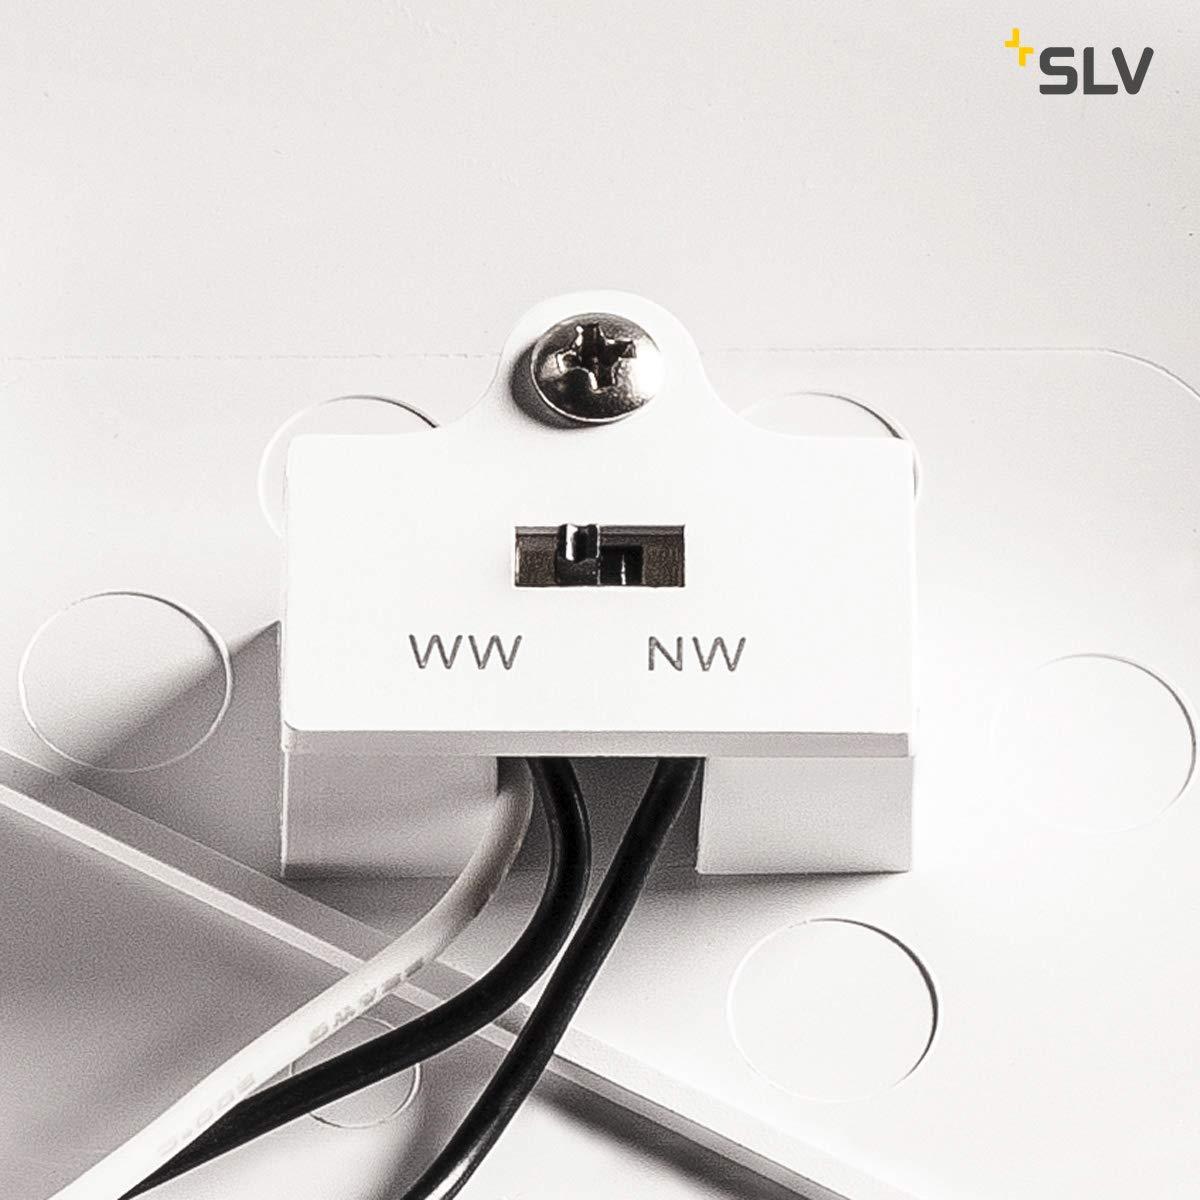 SLV RUBA 10 CW Sensor, LED Outdoor Wand- und Deckenaufbauleuchte, Deckenaufbauleuchte, Deckenaufbauleuchte, weiß IP65 3000 4000K Leuchte Kunststoff 13 W 067985